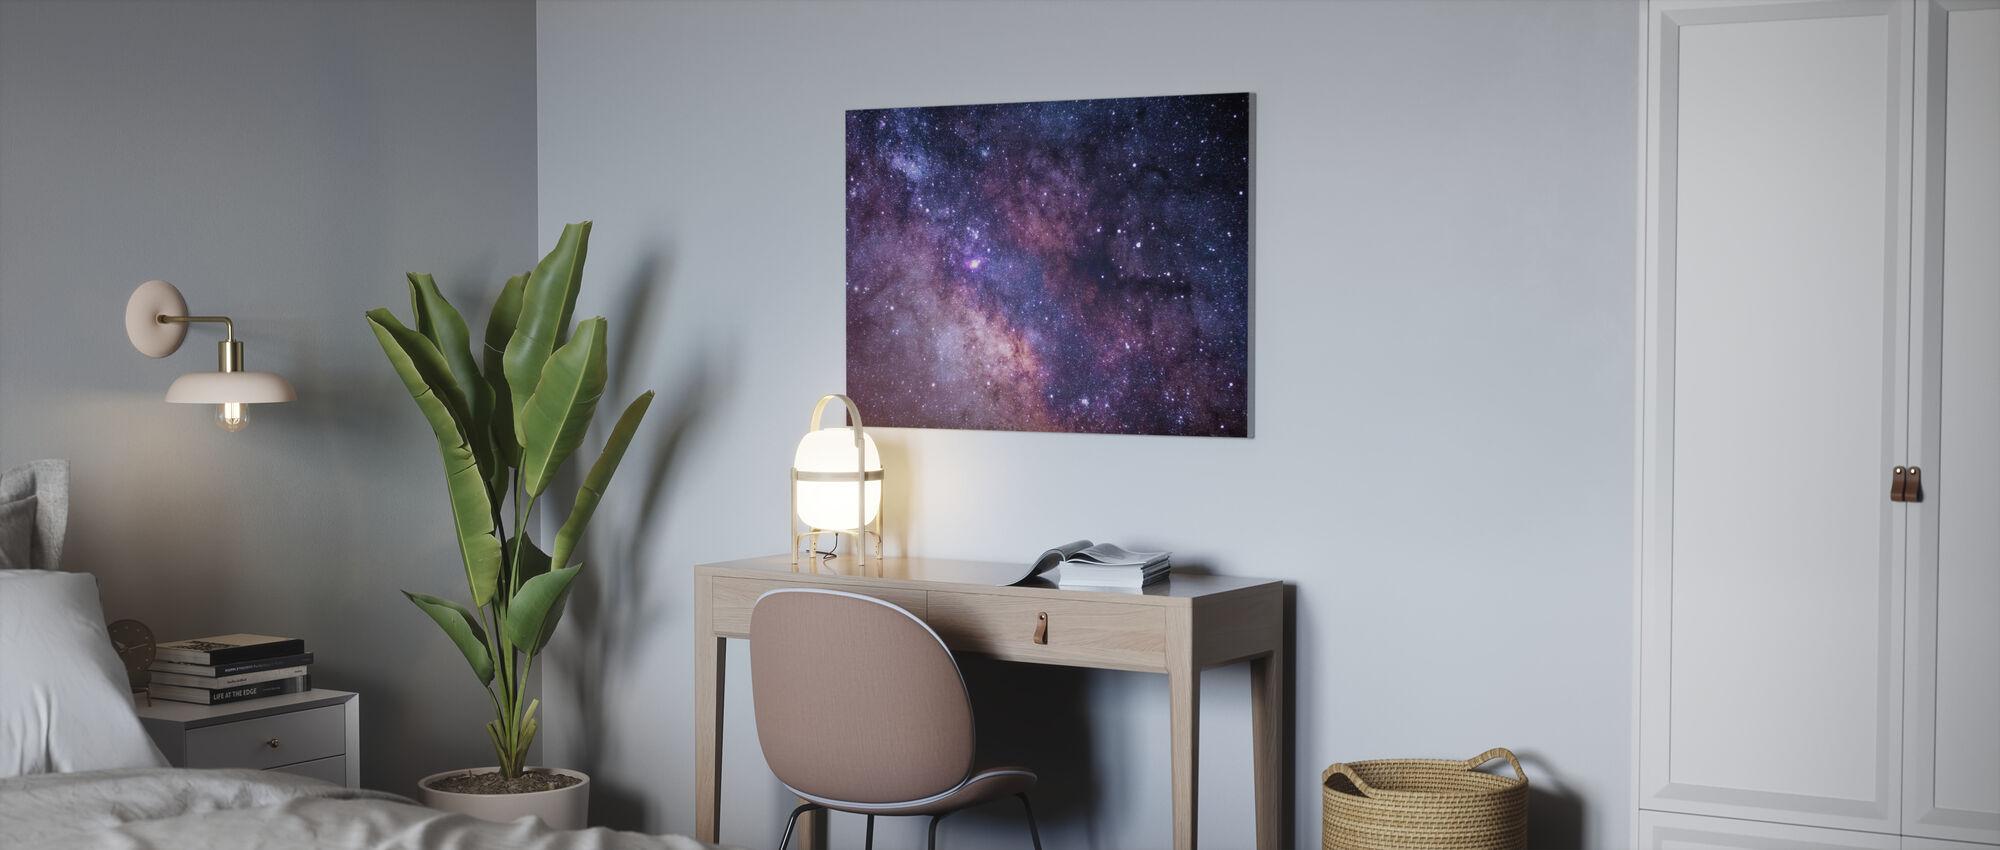 Galaxy - Canvas print - Office